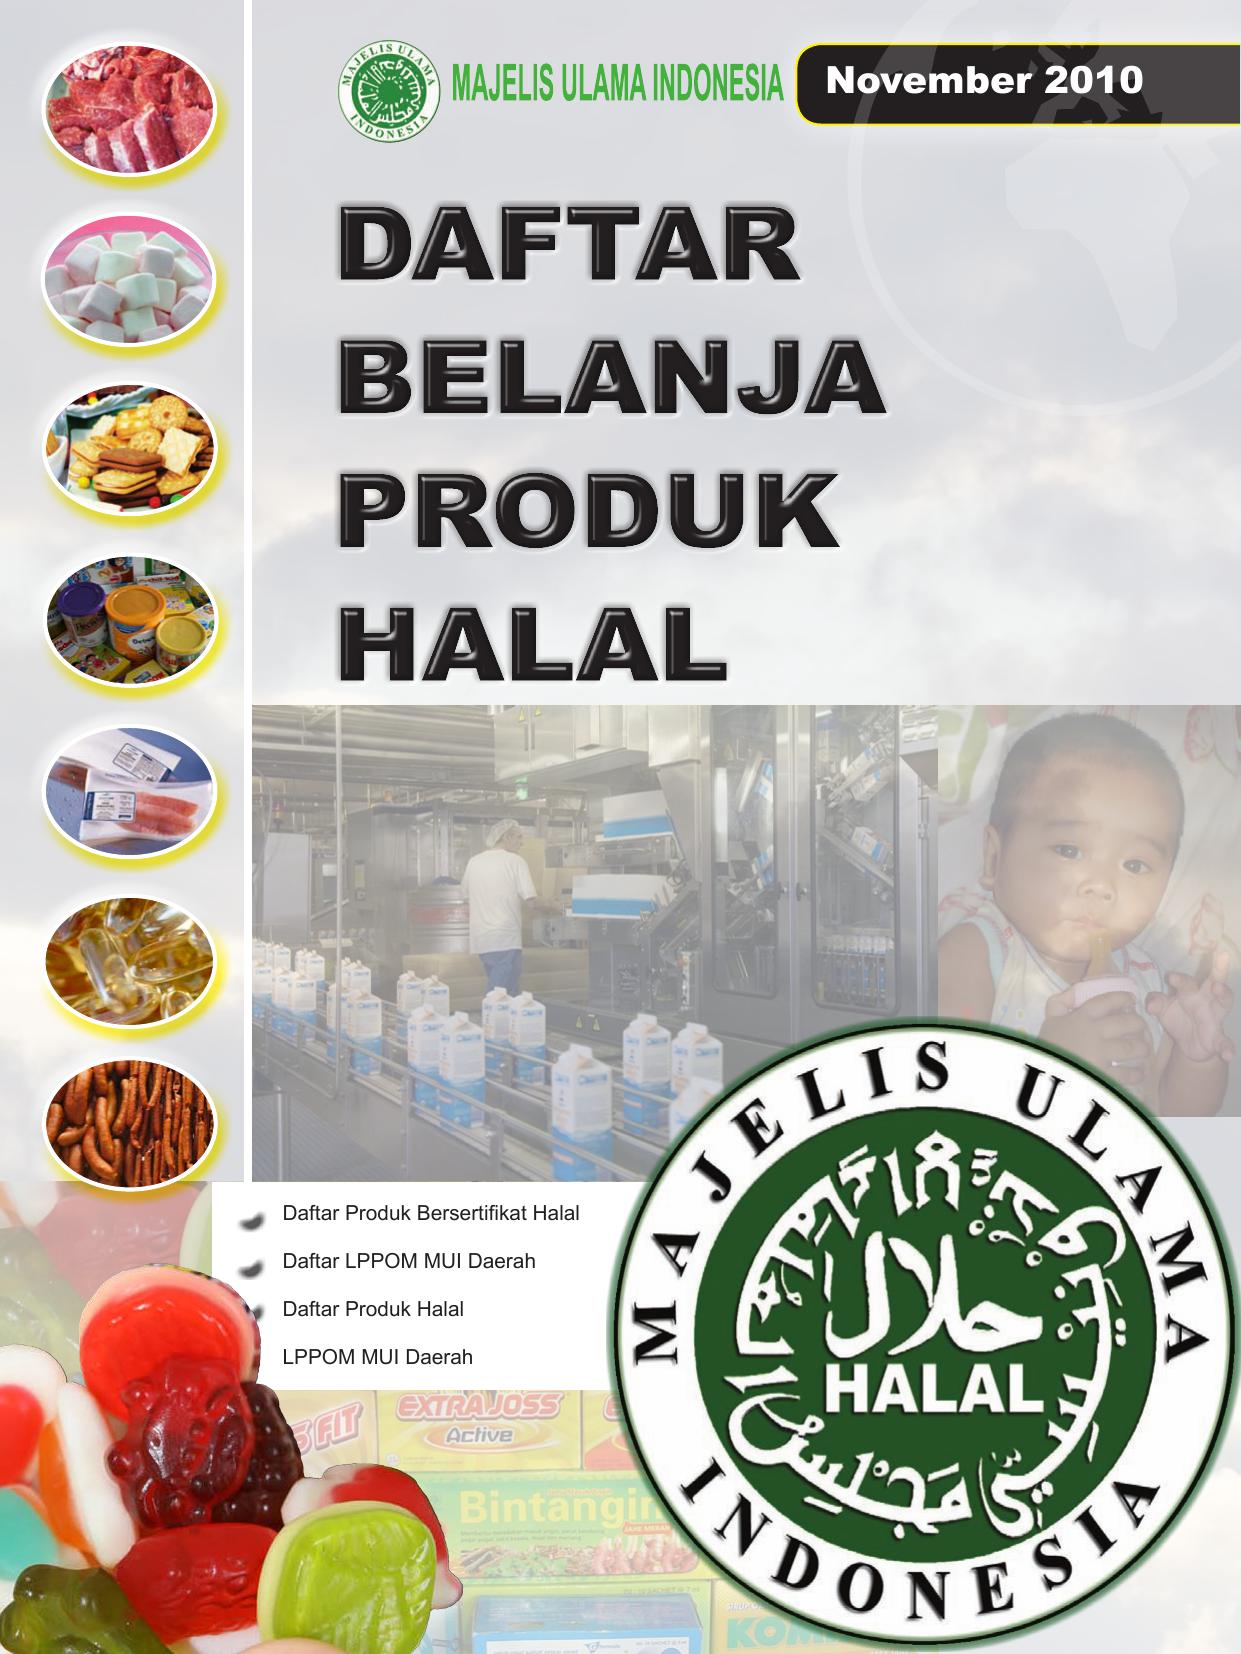 Panduan Belanja Produk Halal Madu By Sheshe Selada Sf